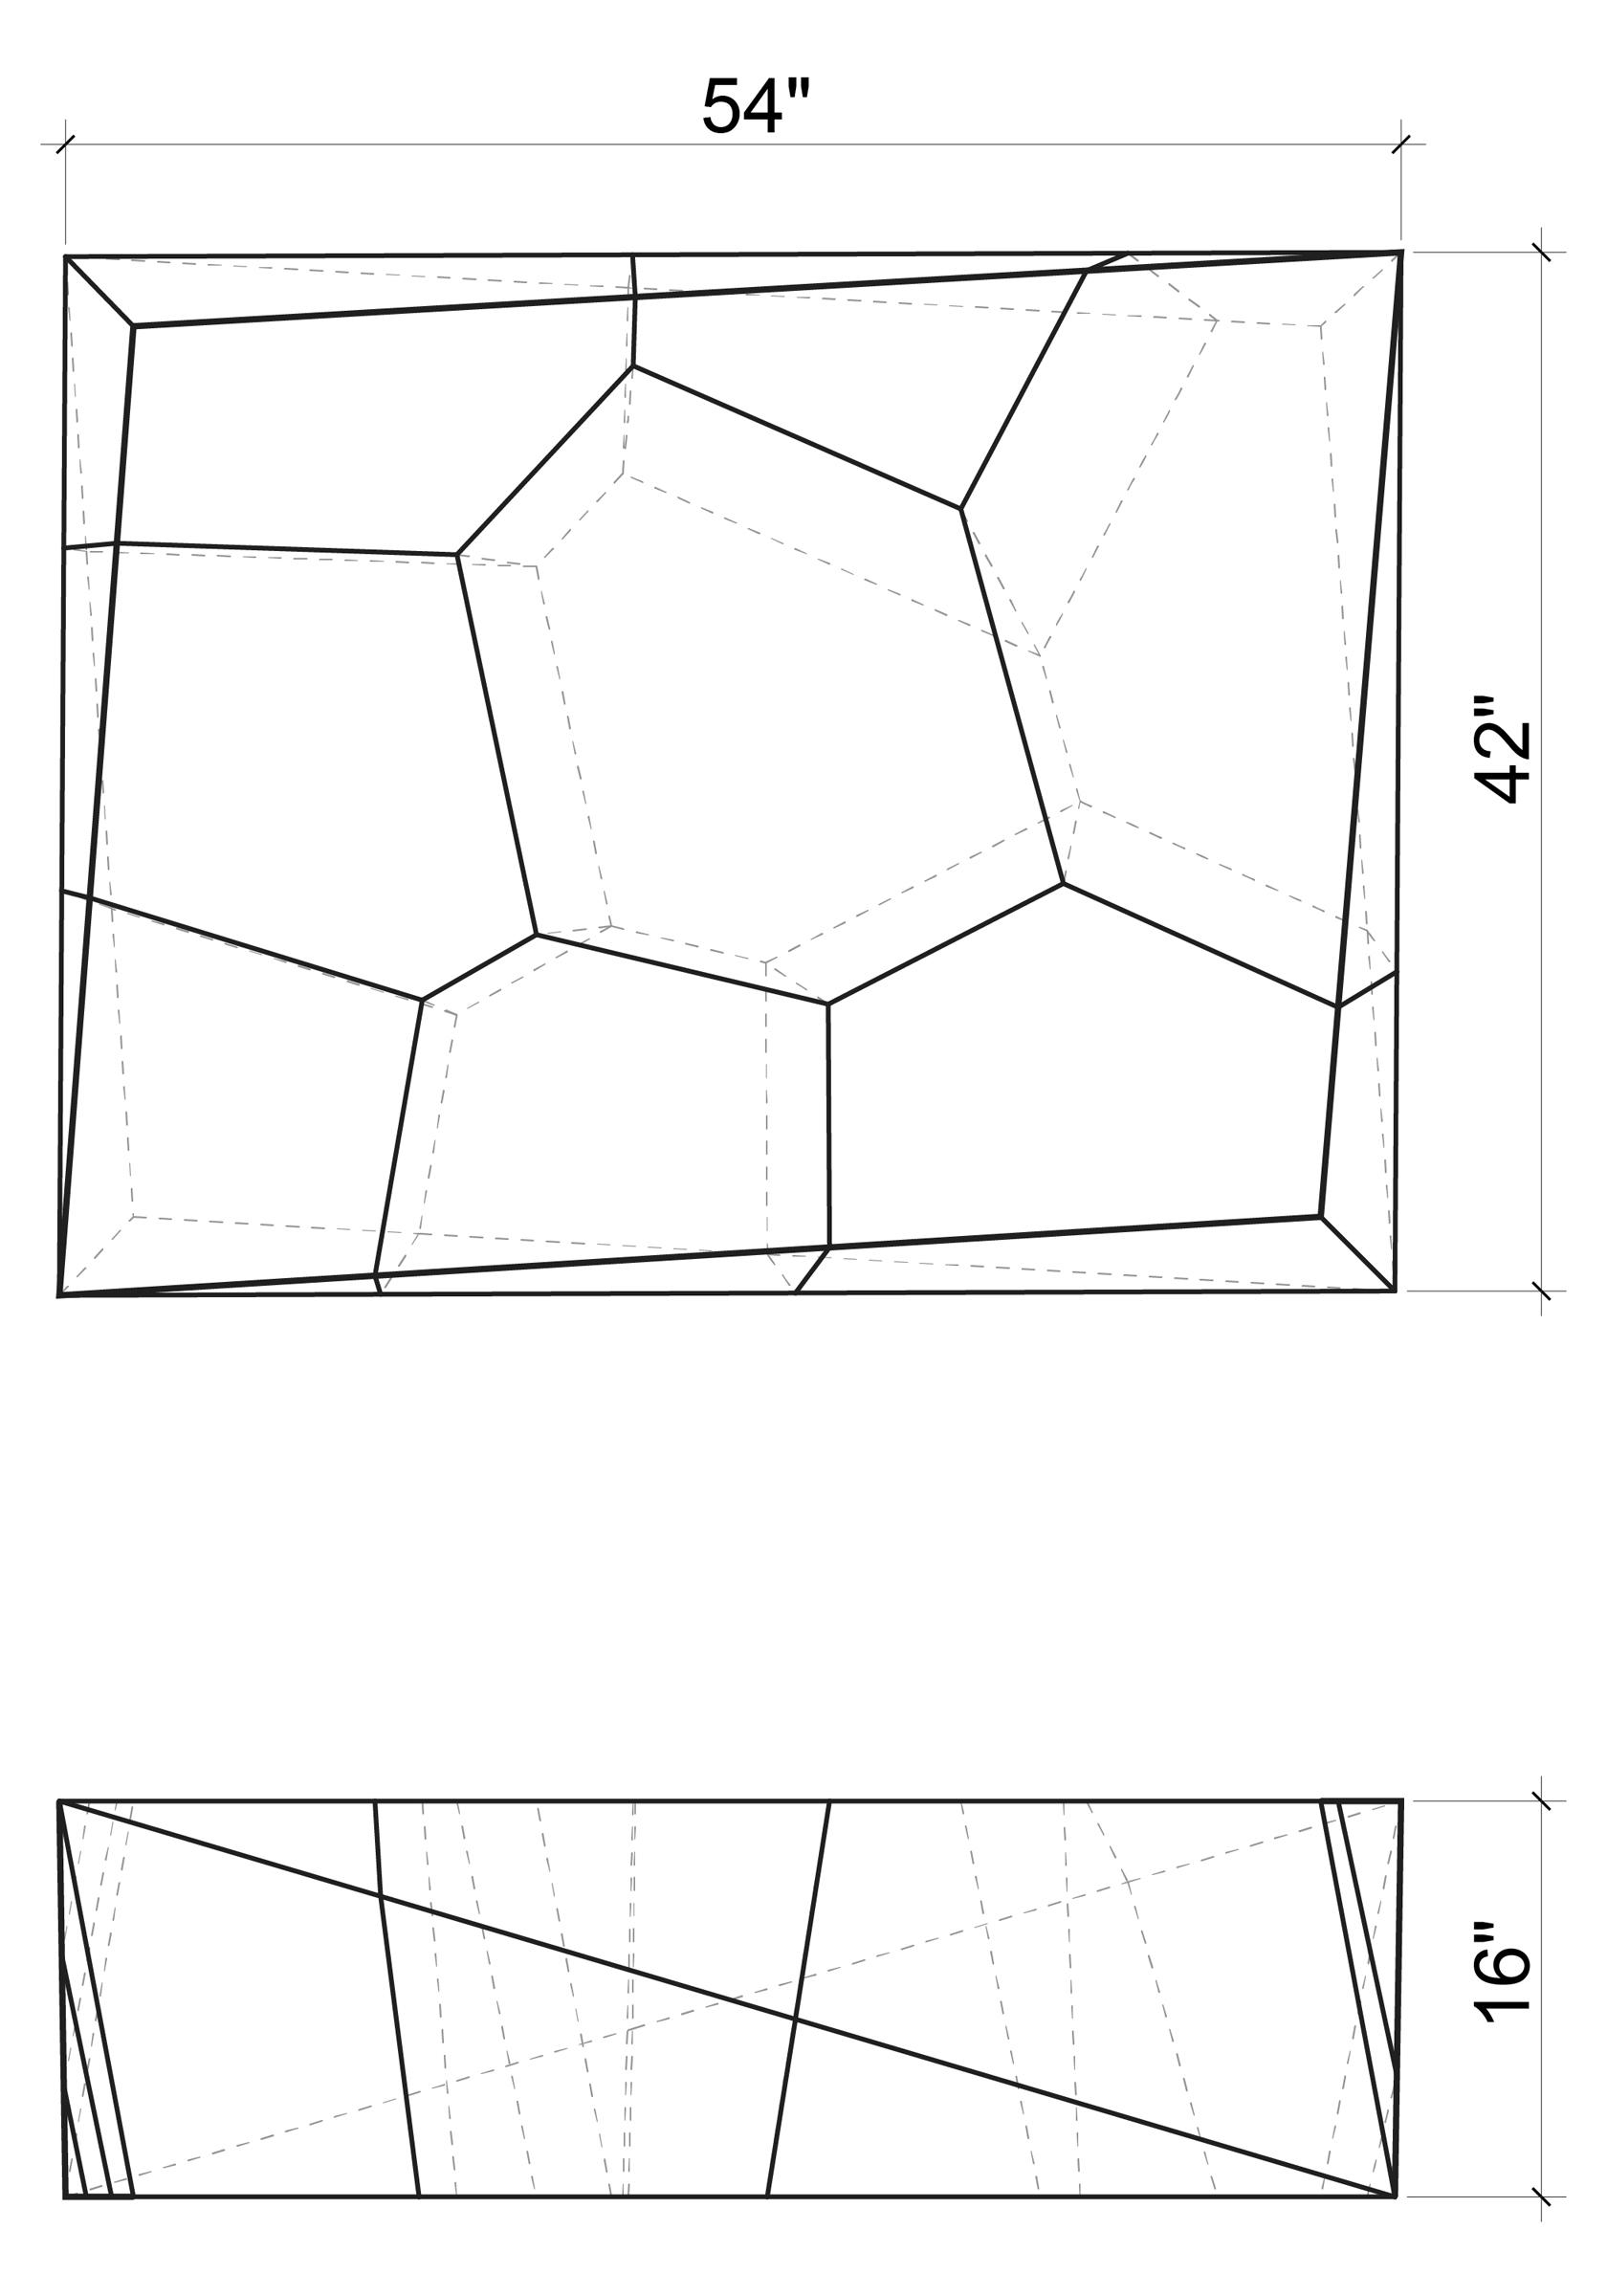 Soft Stones Actual Architecture